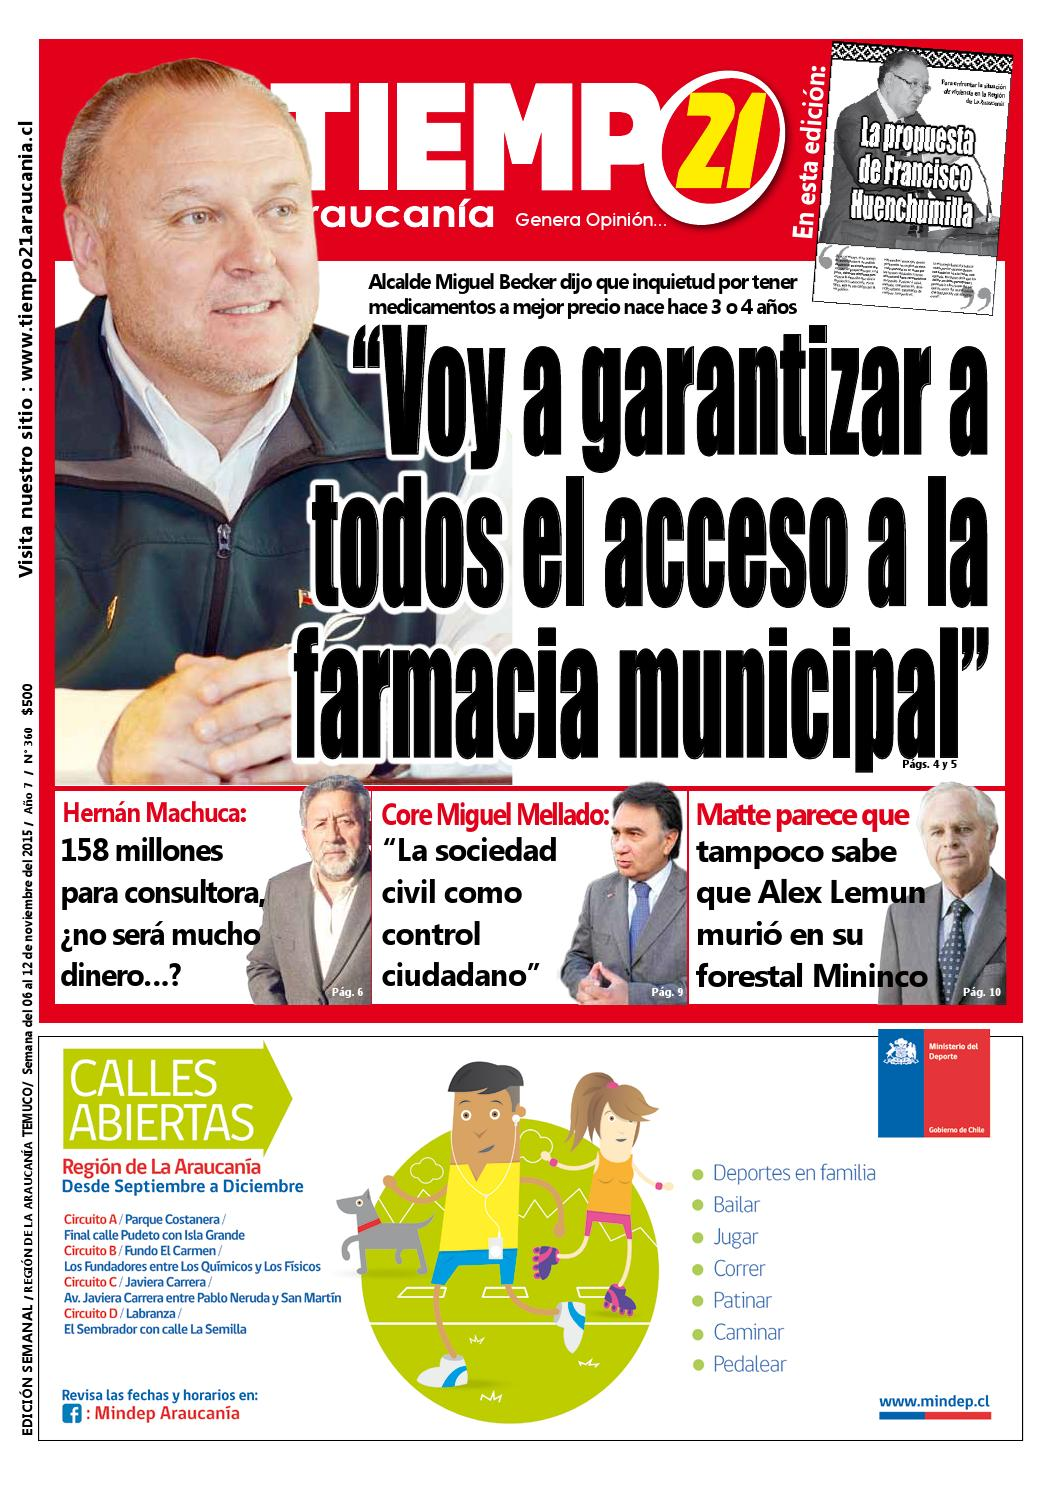 Muebles Mehuin Rancagua - Edici N 360 Alcalde Miguel Becker Voy A Garantizar A Todos El [mjhdah]http://www.masisa.com/chi/wp-content/files_mf/1431703860FOTOSGUIAELMUEBLISTA2015.jpg